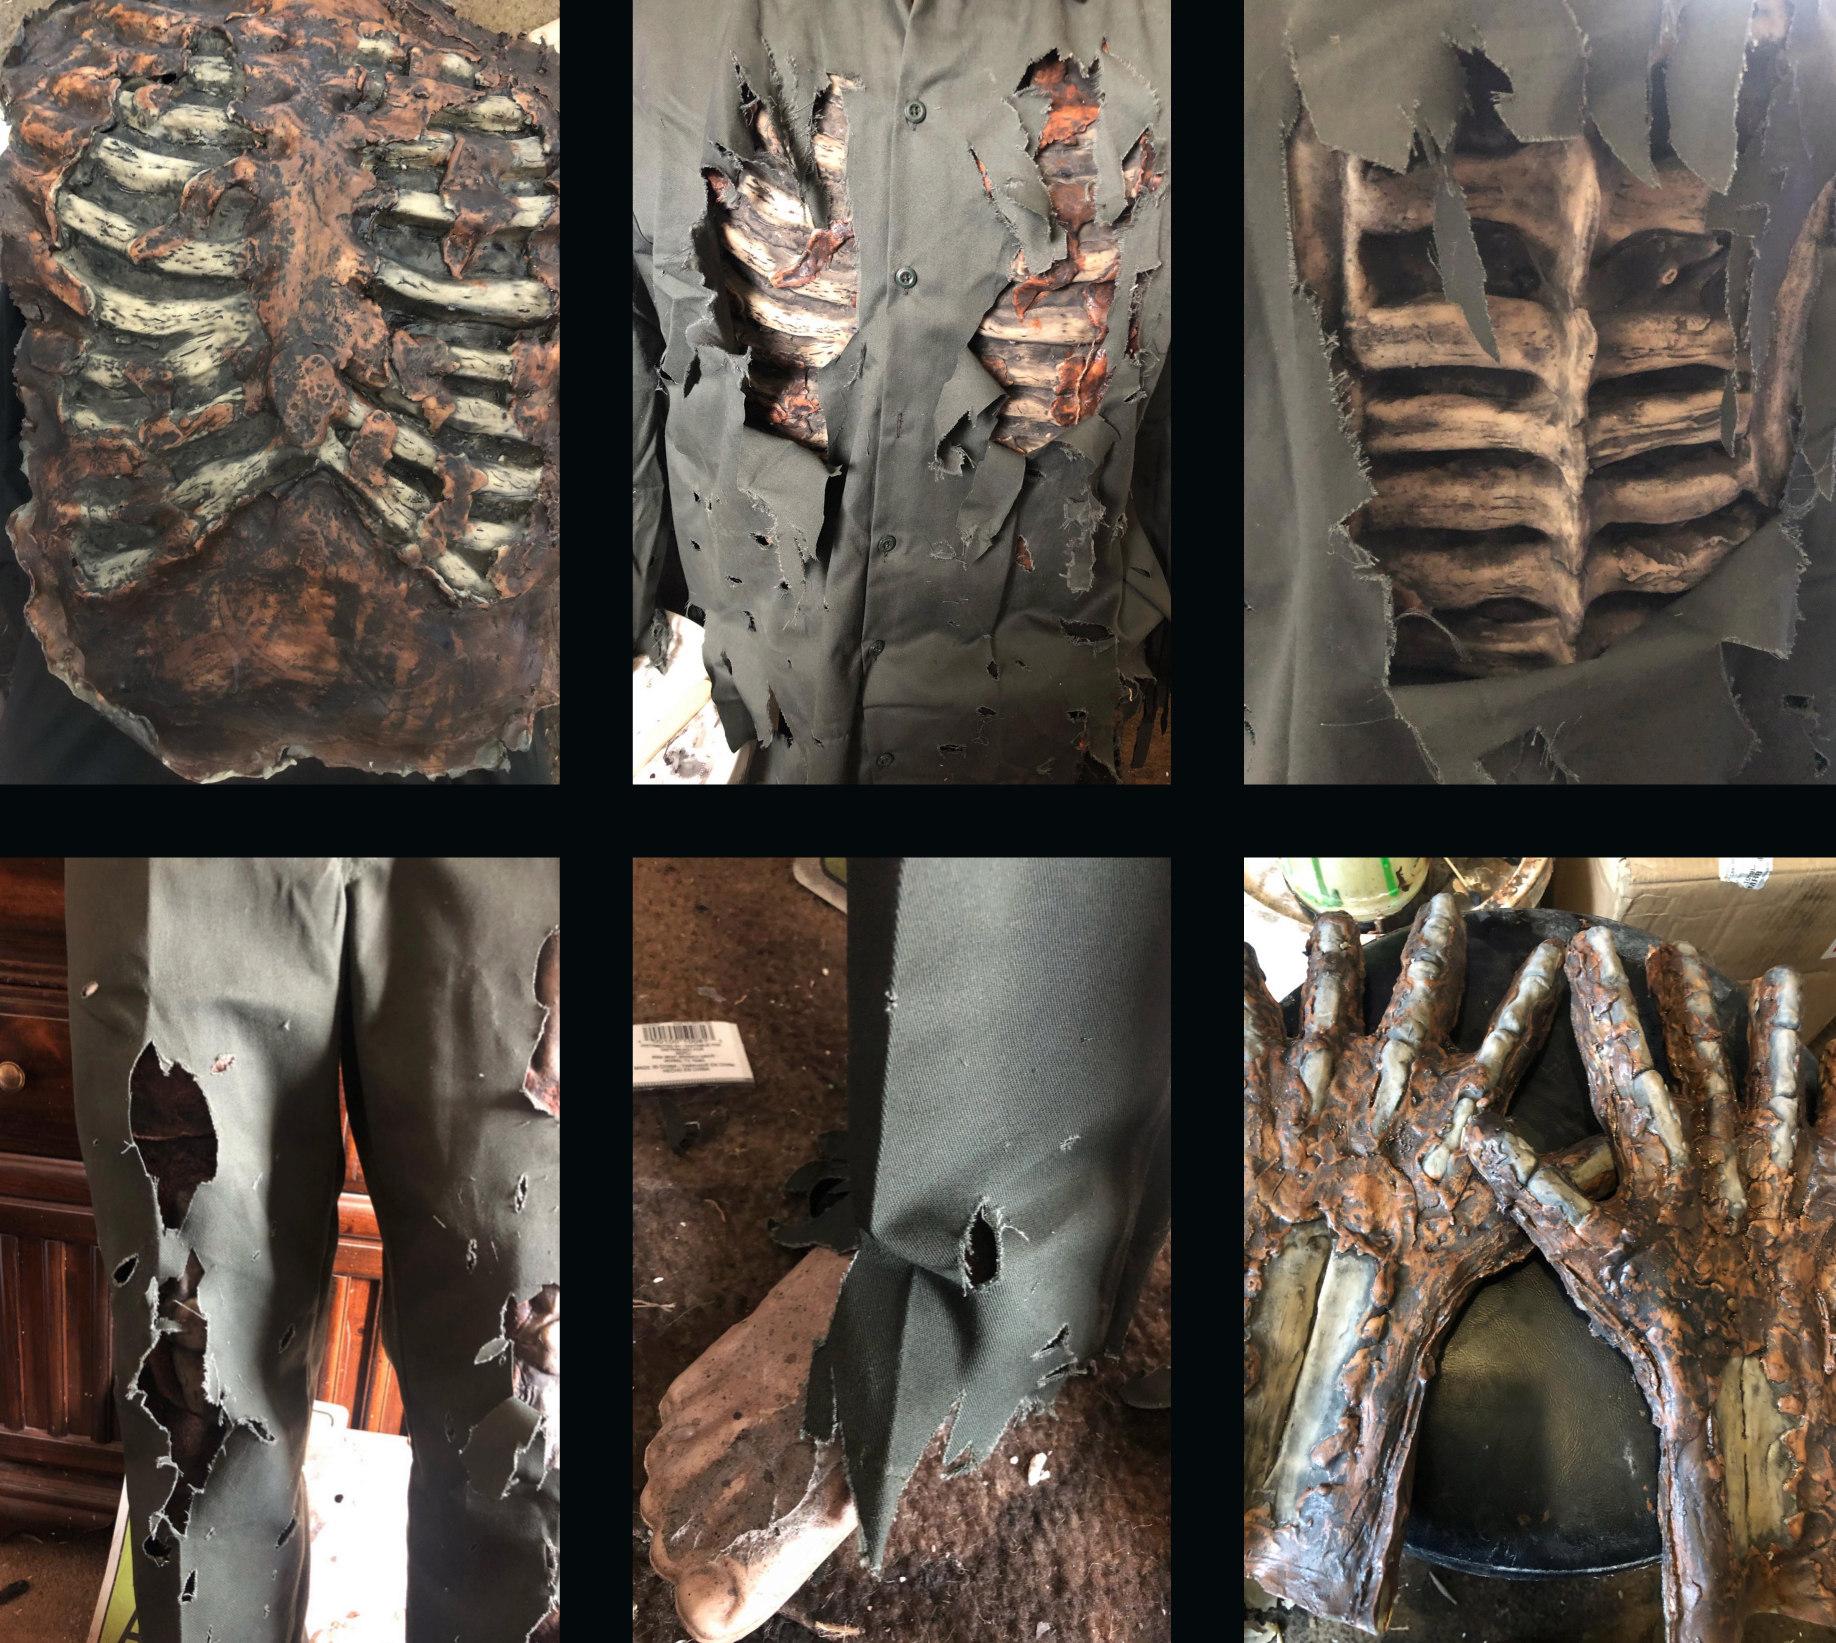 My Part 7 Jason Voorhees Costume Img_2025